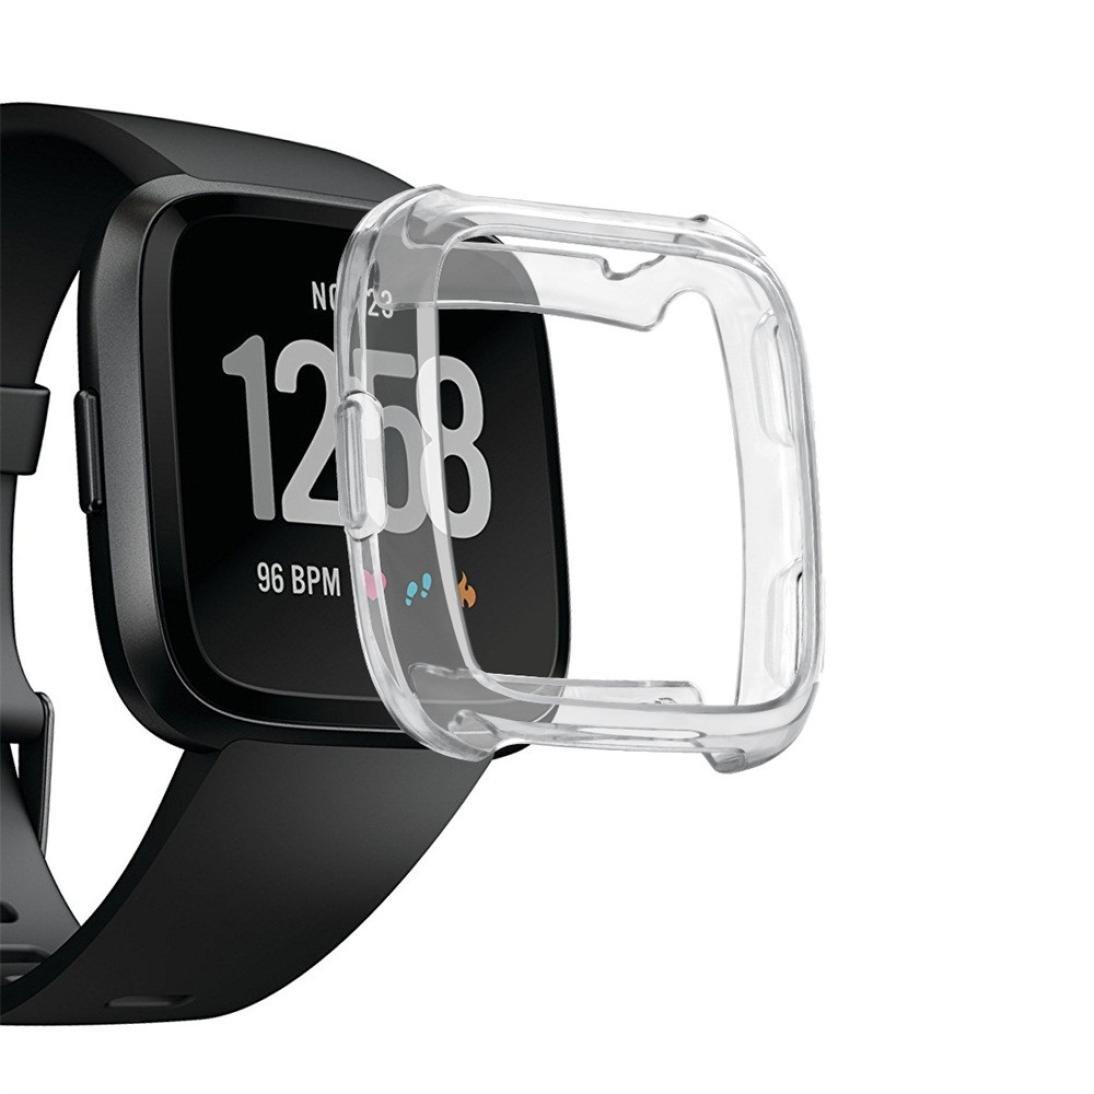 Iusun For Fitbit Versa Smartwatch Screen Protector, Ultra TPU Silicone Cover Case Watch Casing Guard Protector For Fitbit Versa Smart Band (Clear)